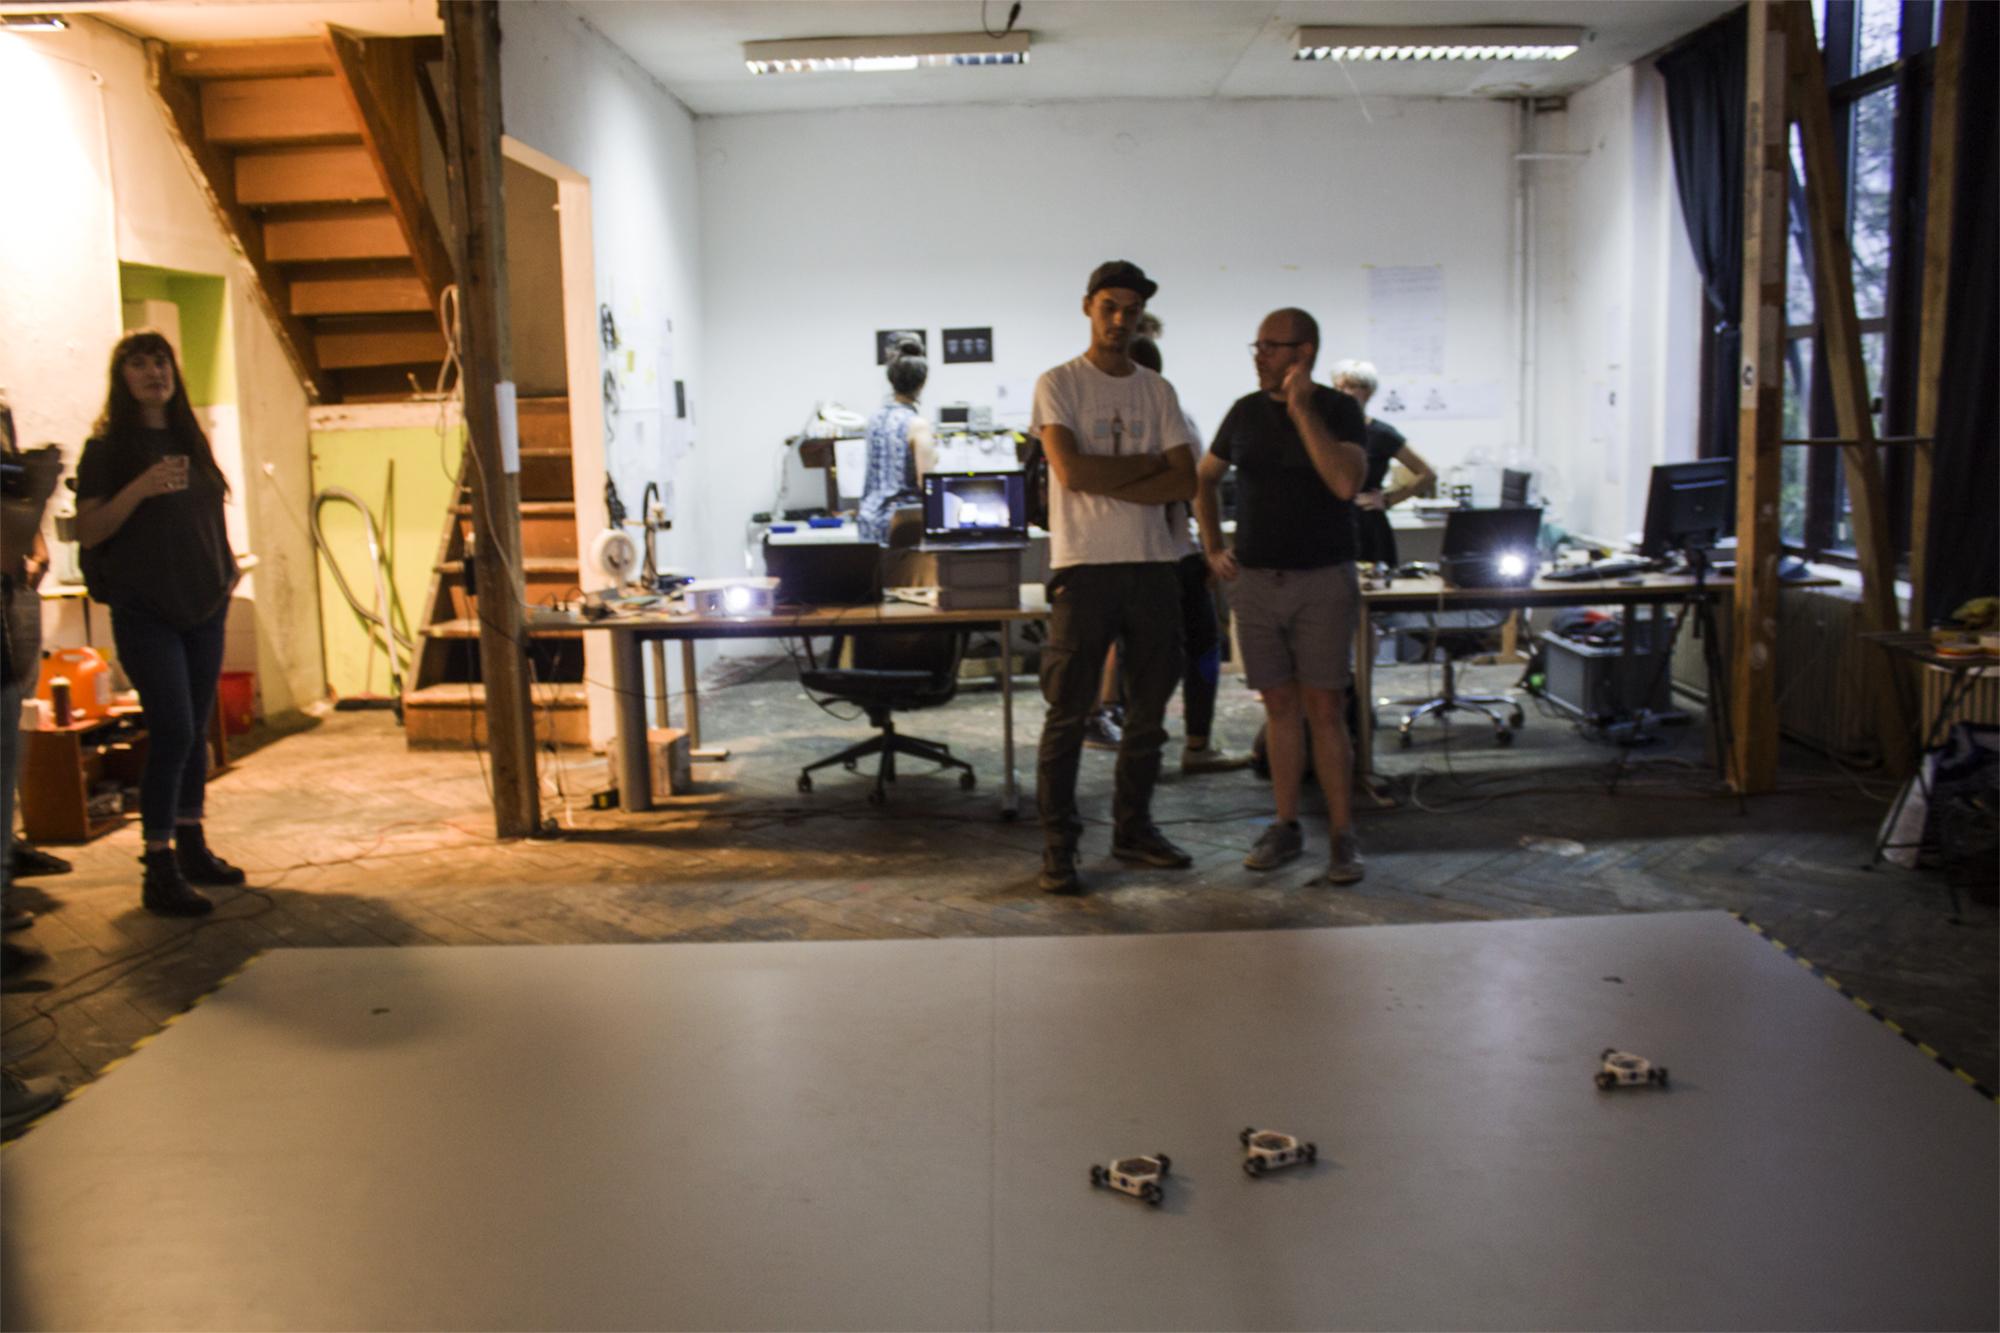 open_studio_empathy_swarm_robots_sm_0018_06